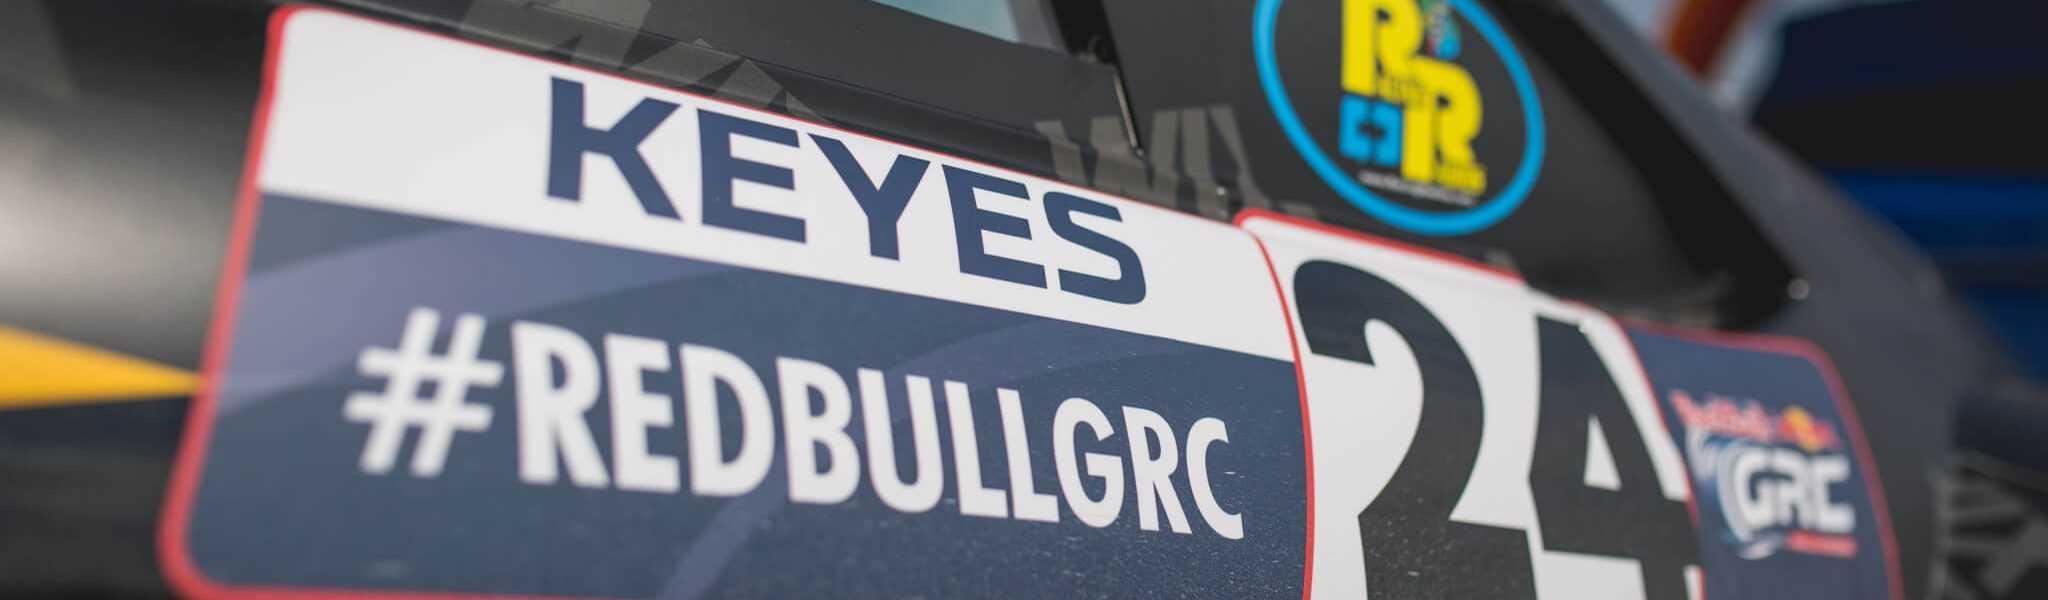 Alex Keyes RedBull GRC Winning weekend